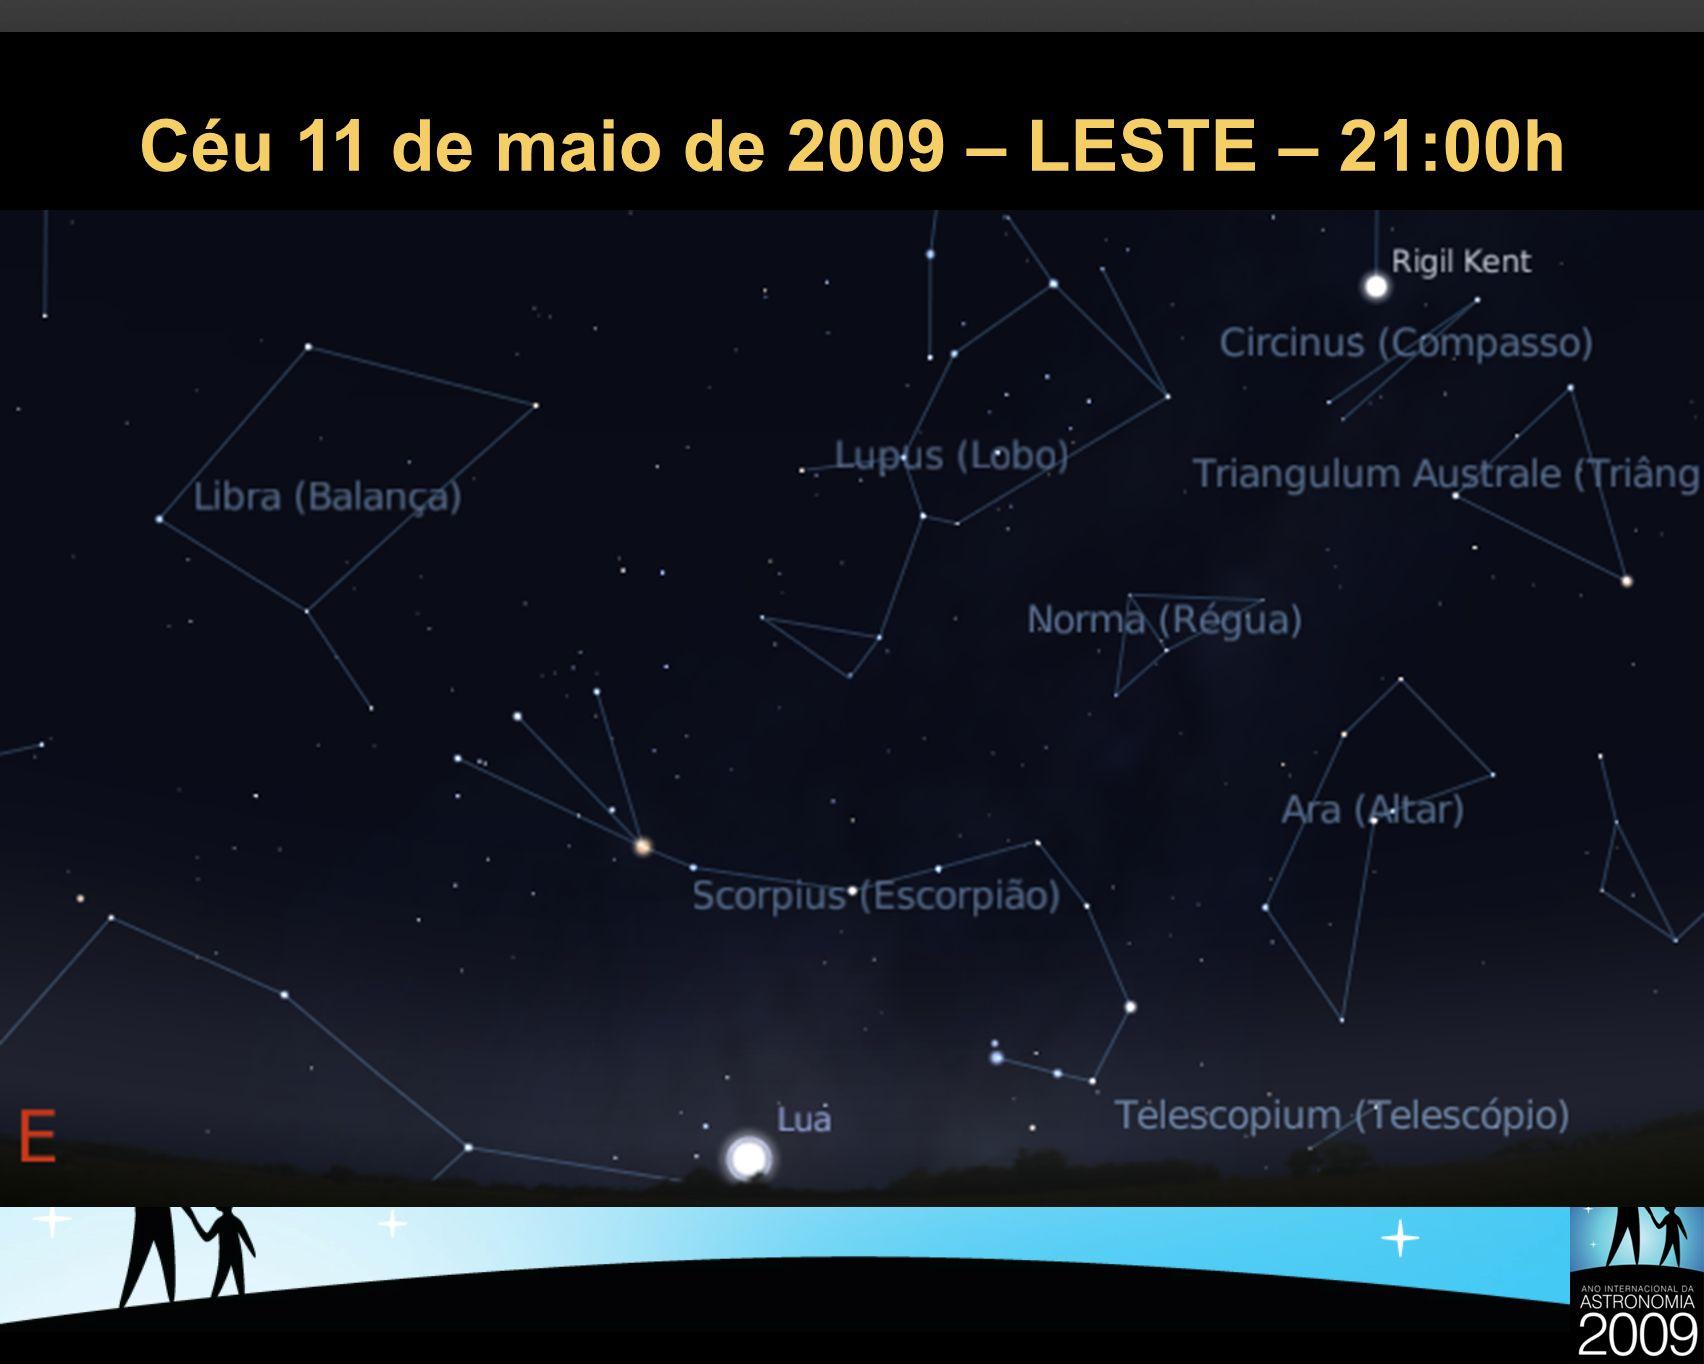 Céu 11 de maio de 2009 – LESTE – 21:00h